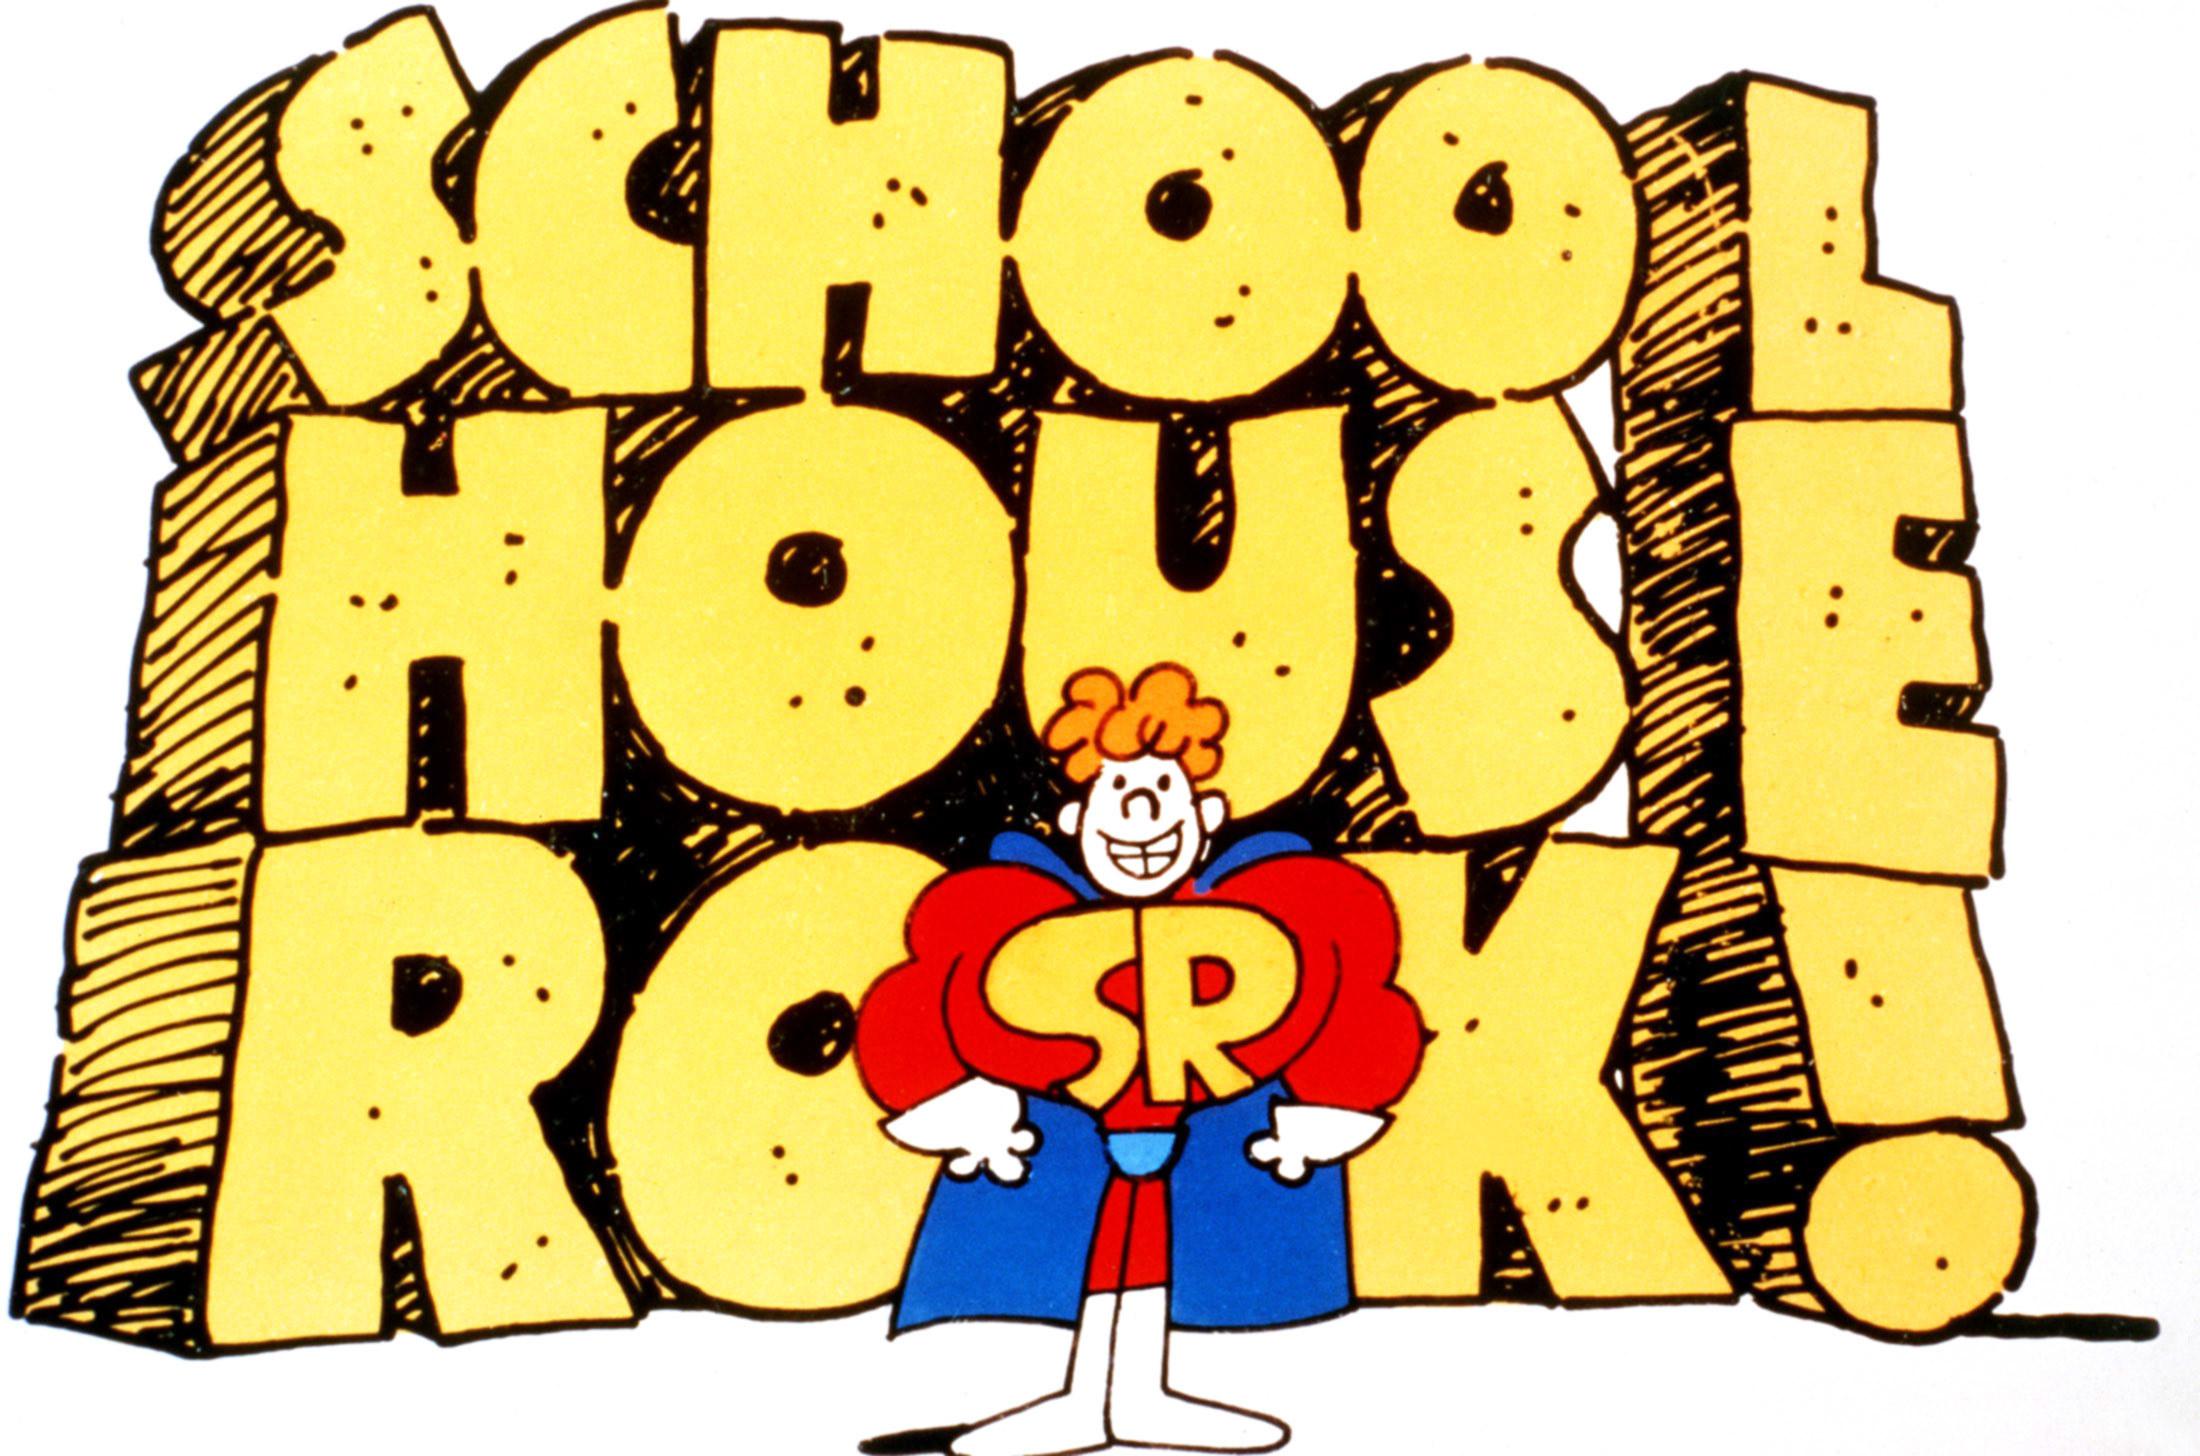 The Schoolhouse Rock Logo